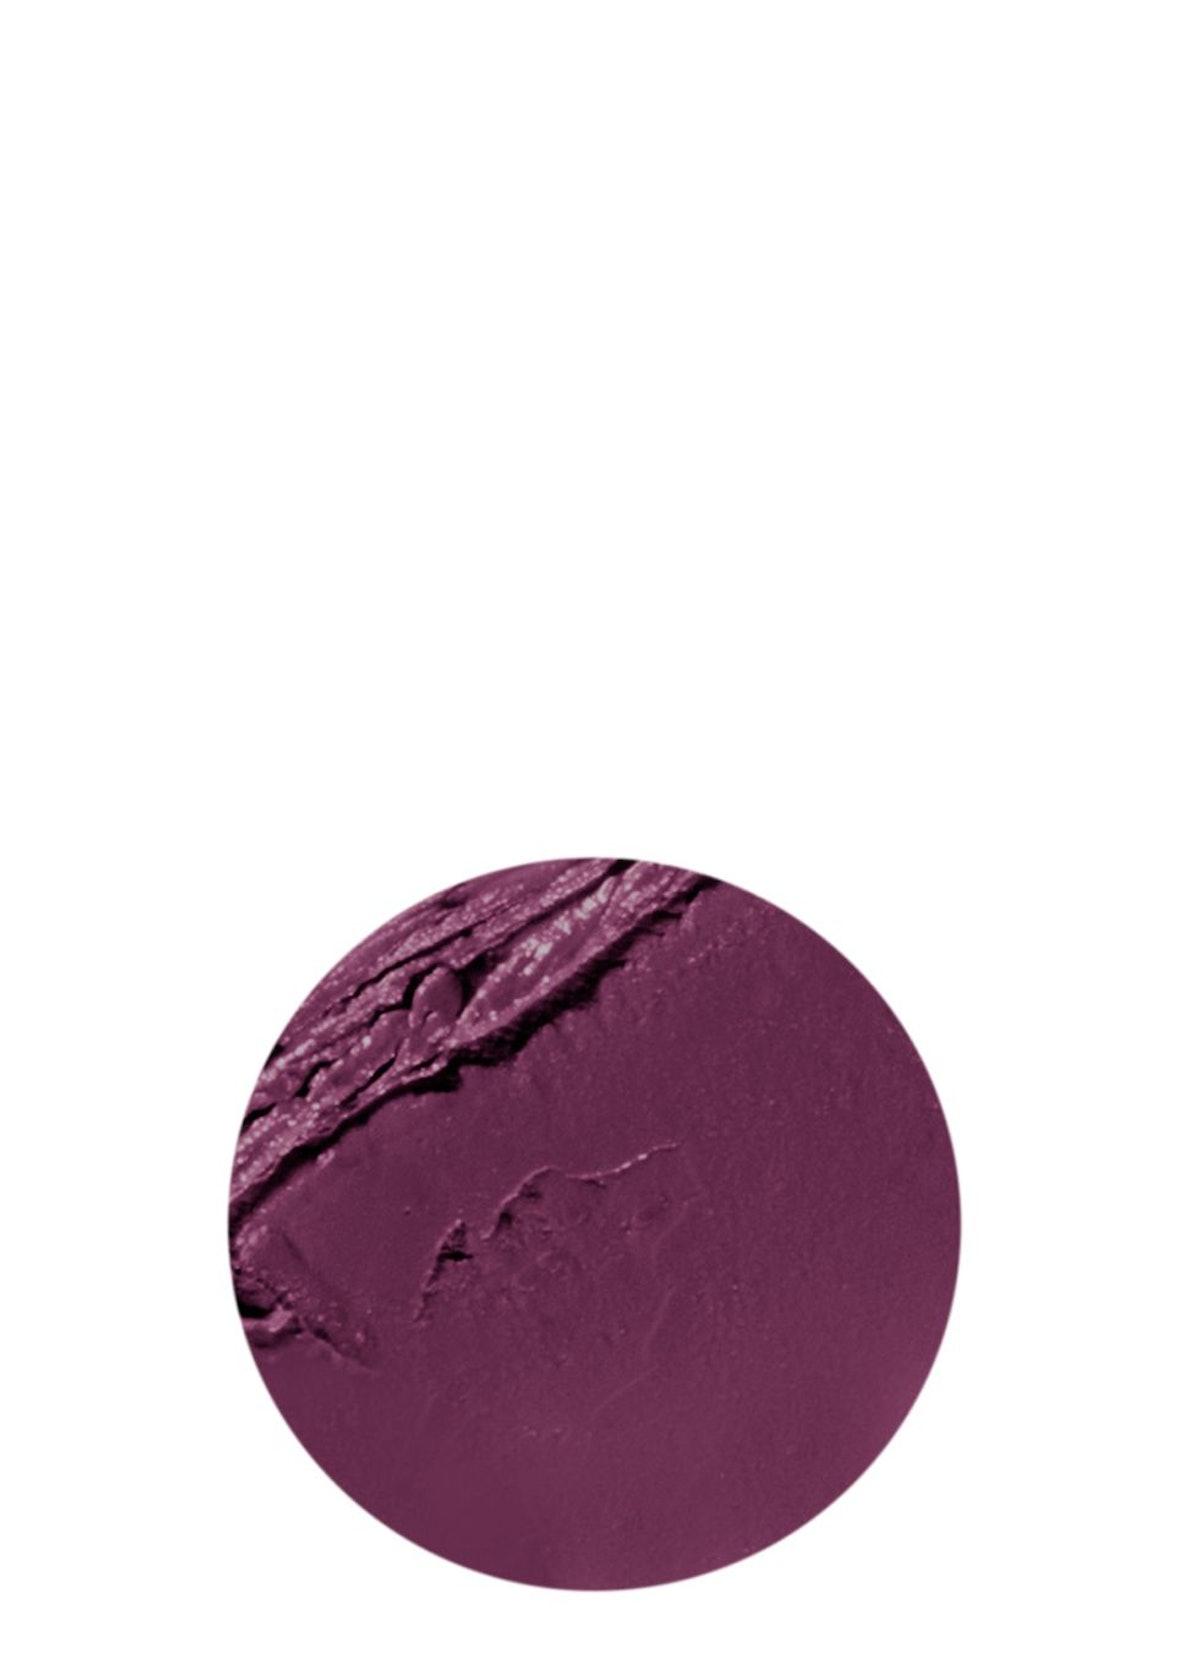 Le Marc Lip Crème Lipstick: additional image